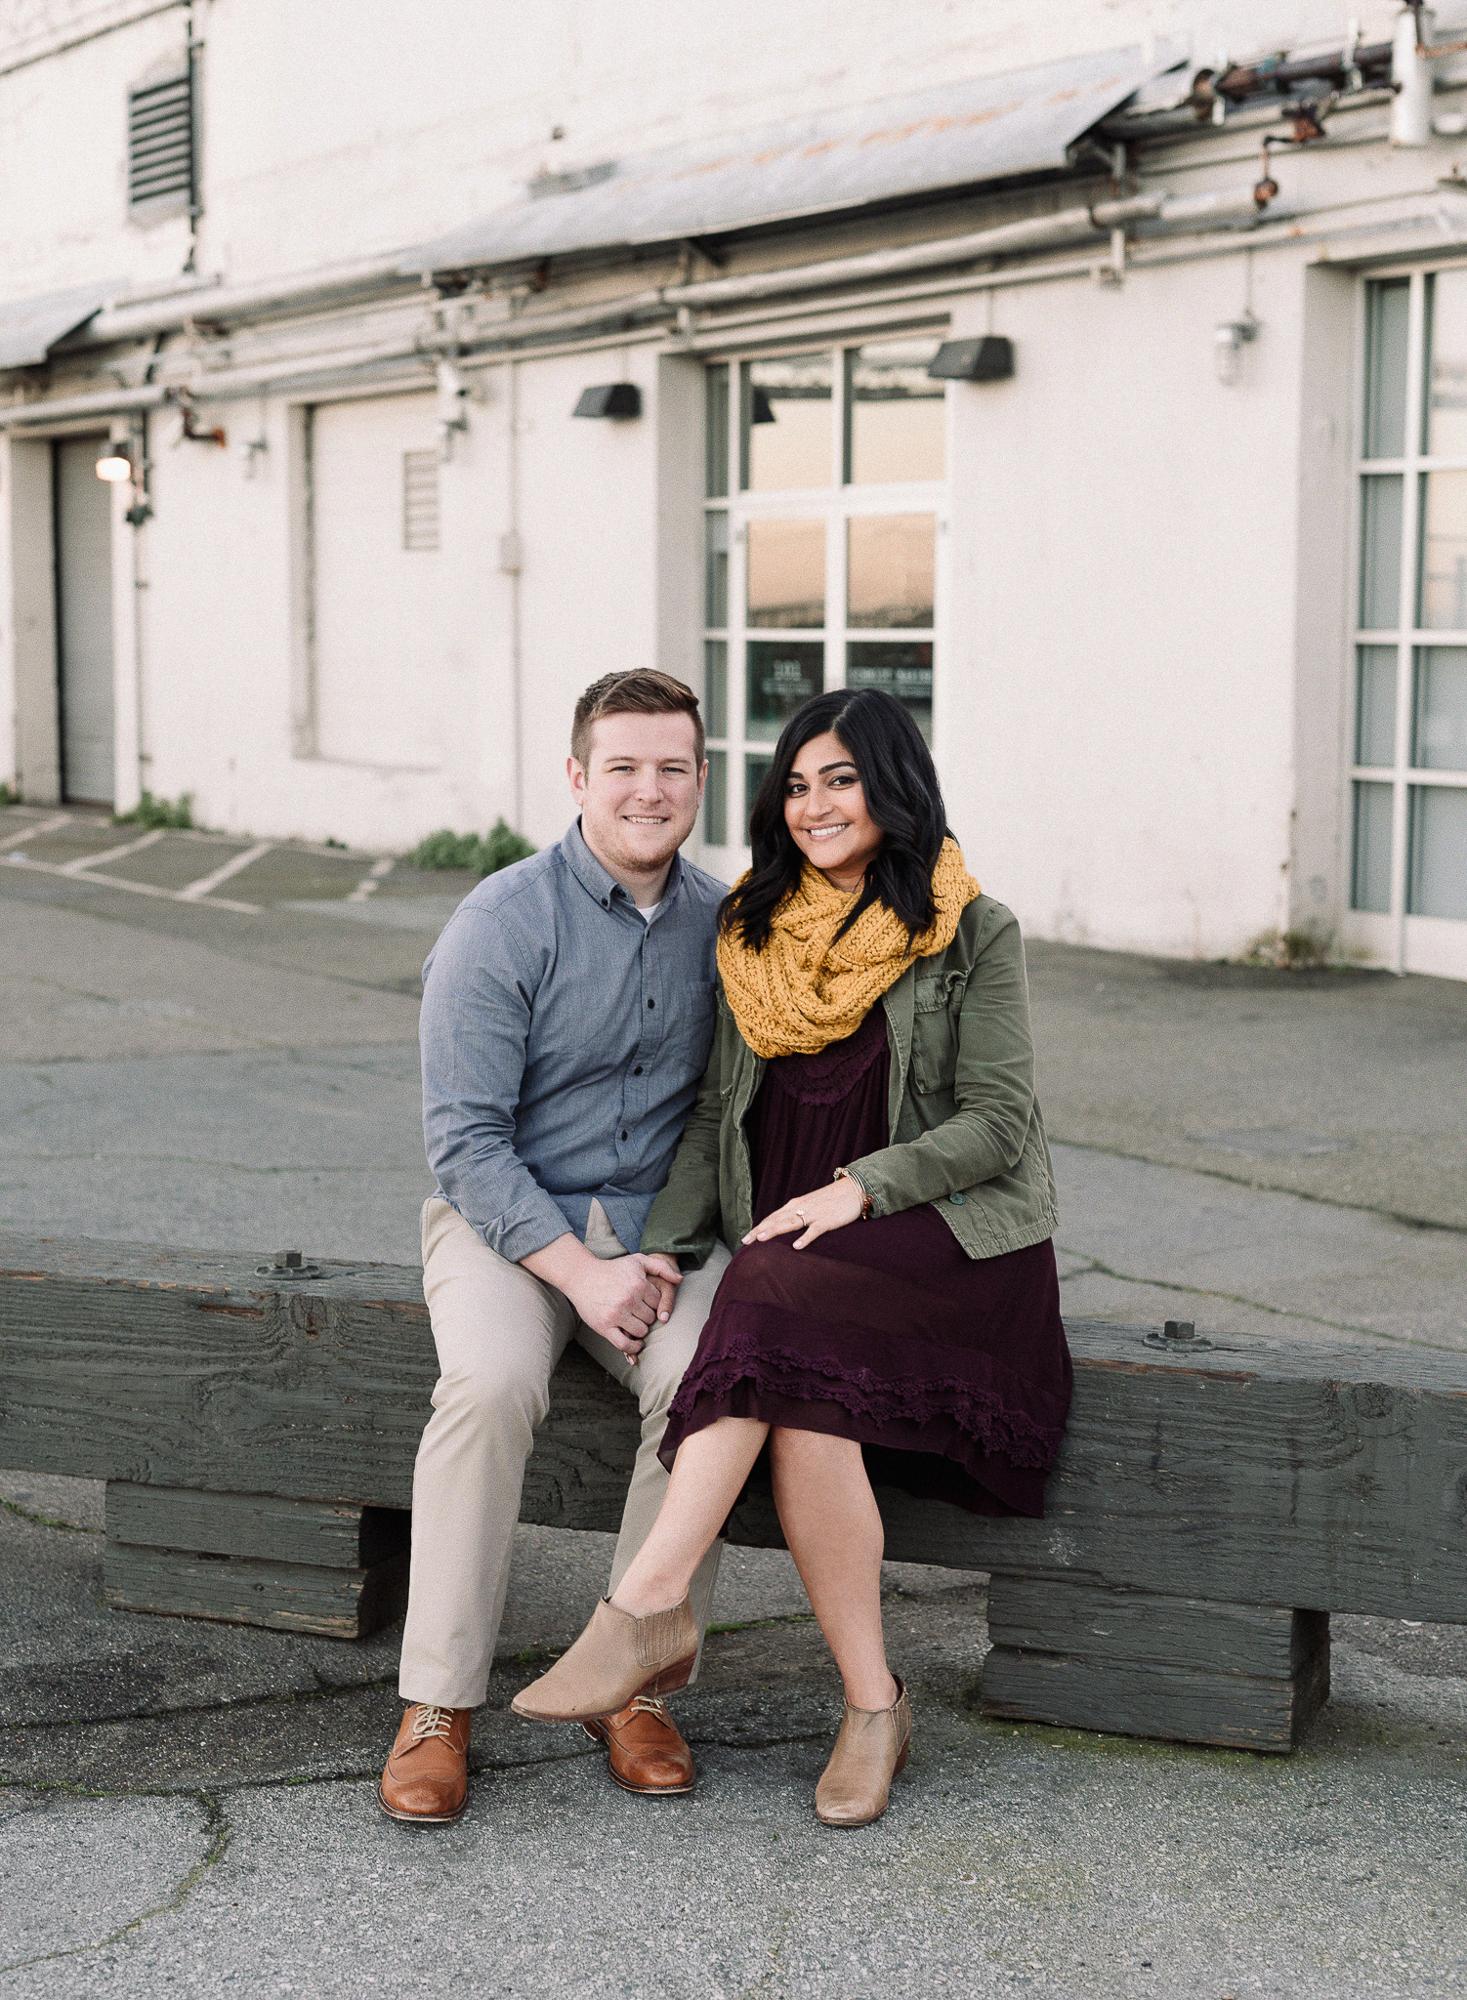 San Francisco Engagement Photographs by Caroline Alexander Photo